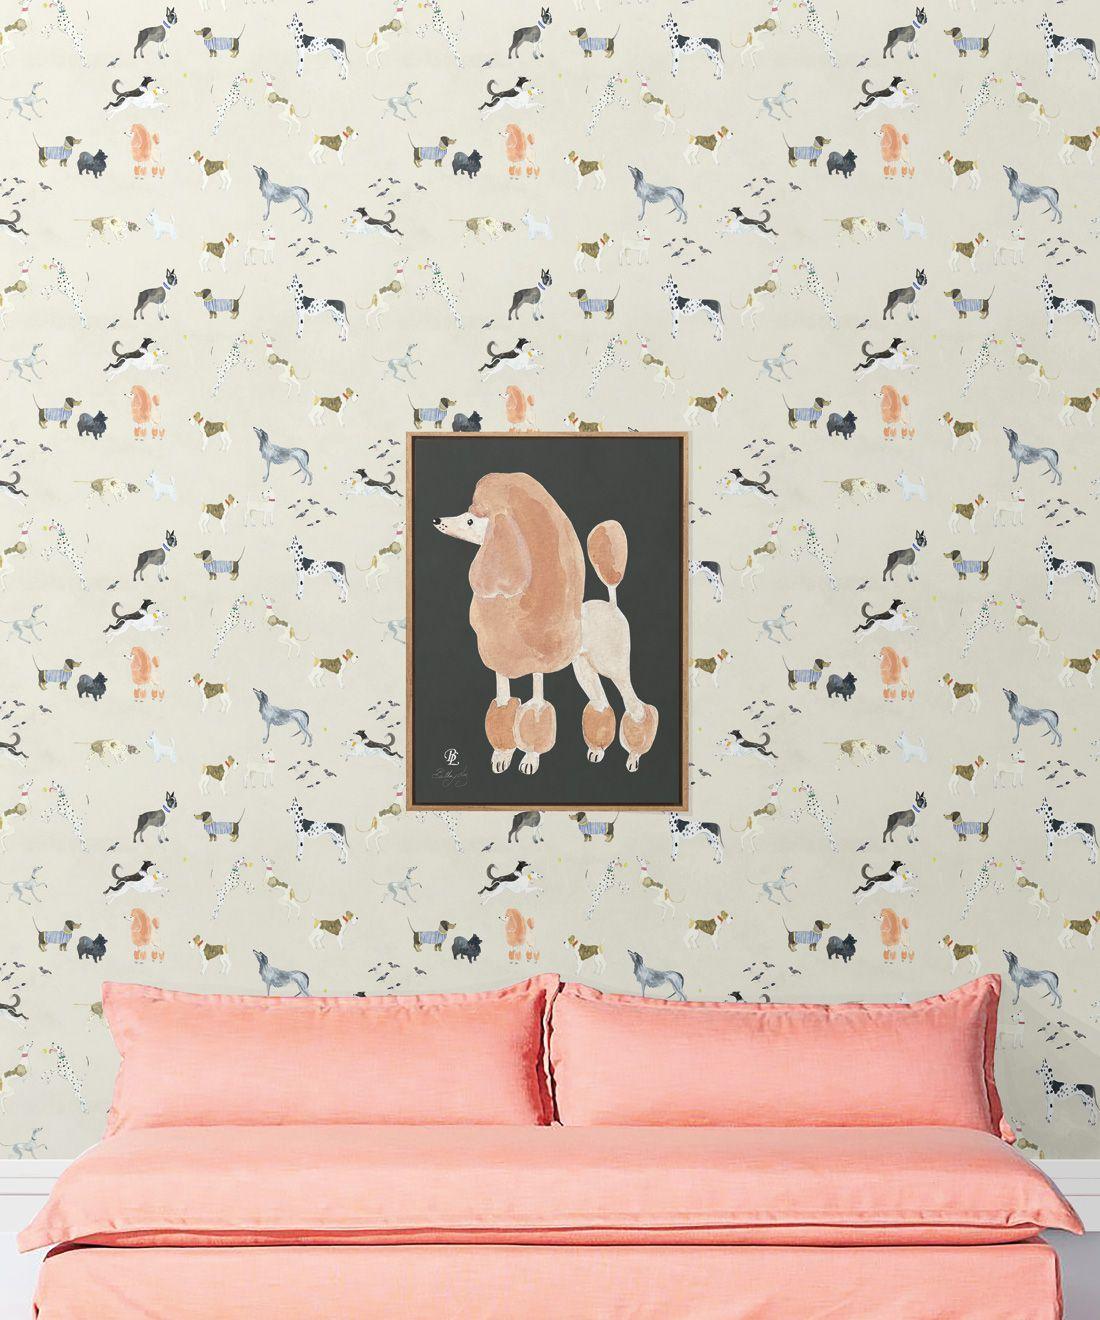 Doggies Wallpaper •Dog Wallpaper •Cream • Insitu with sofa